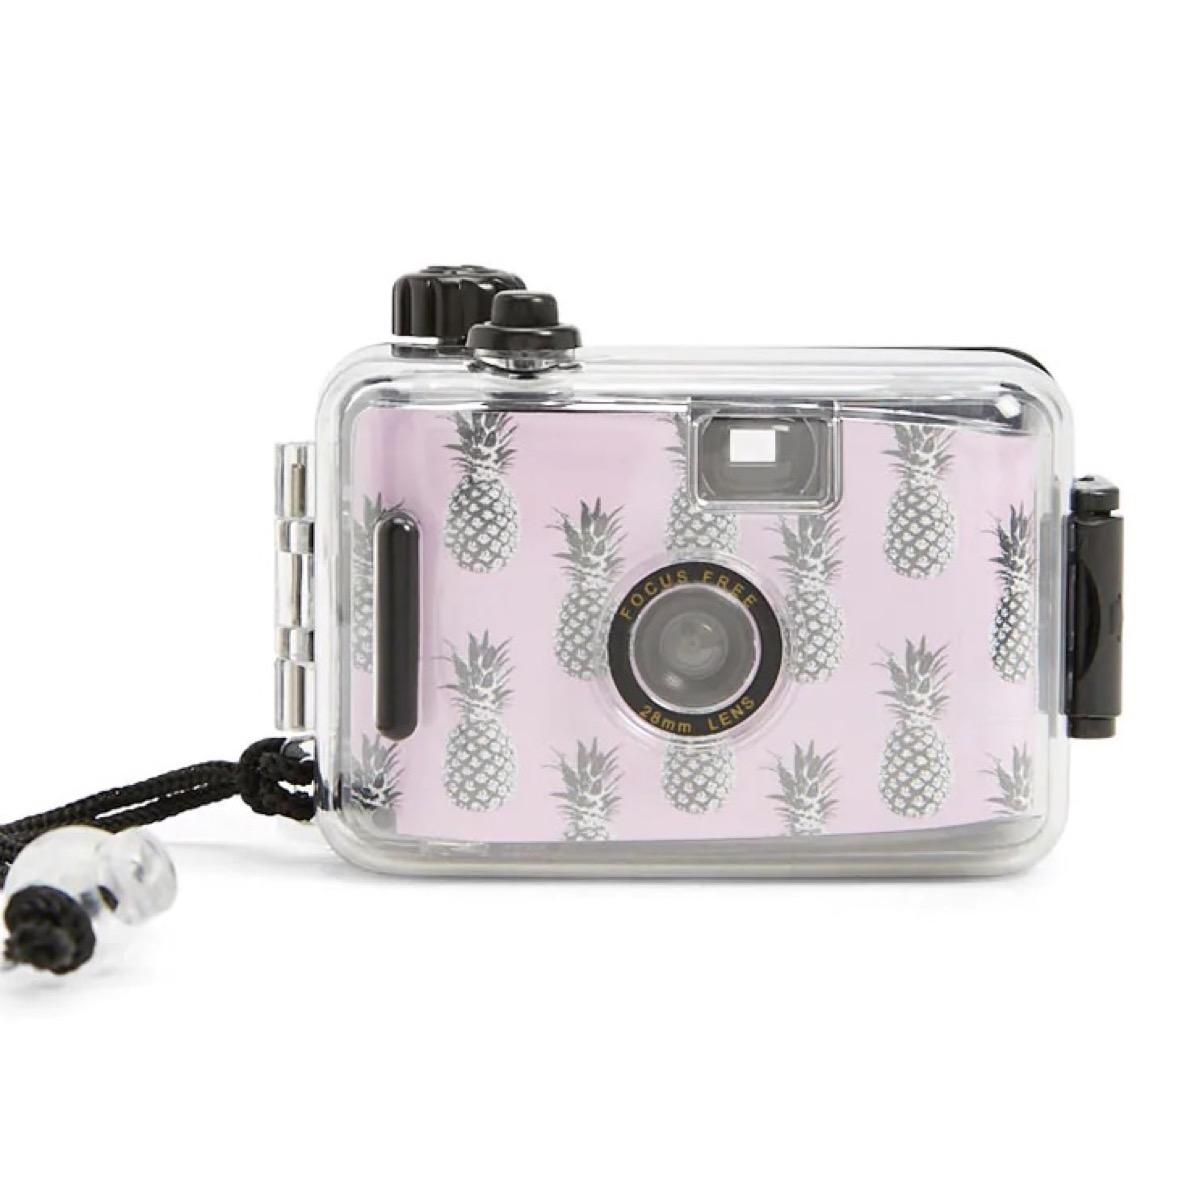 Forever 21 Underwater Camera Travel Accessories